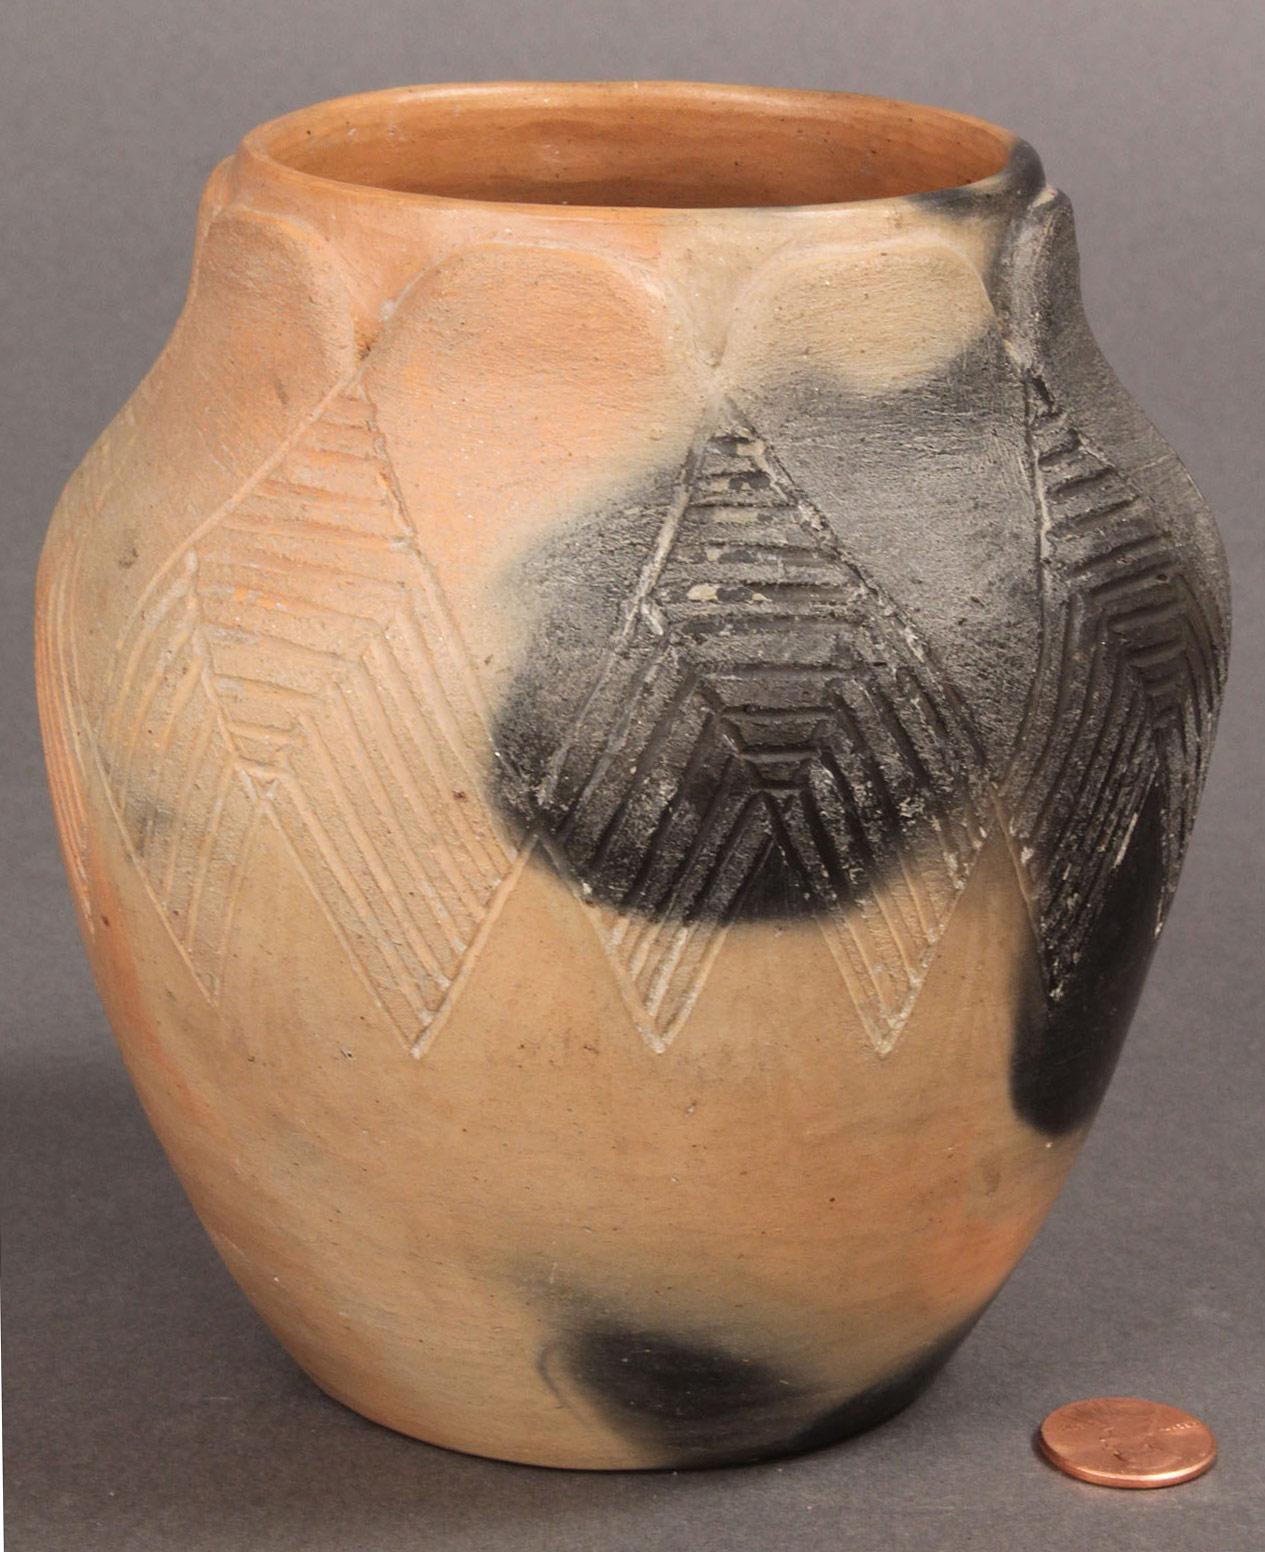 Cherakee Indian Pottery By Dultschxrfg On Deviantart